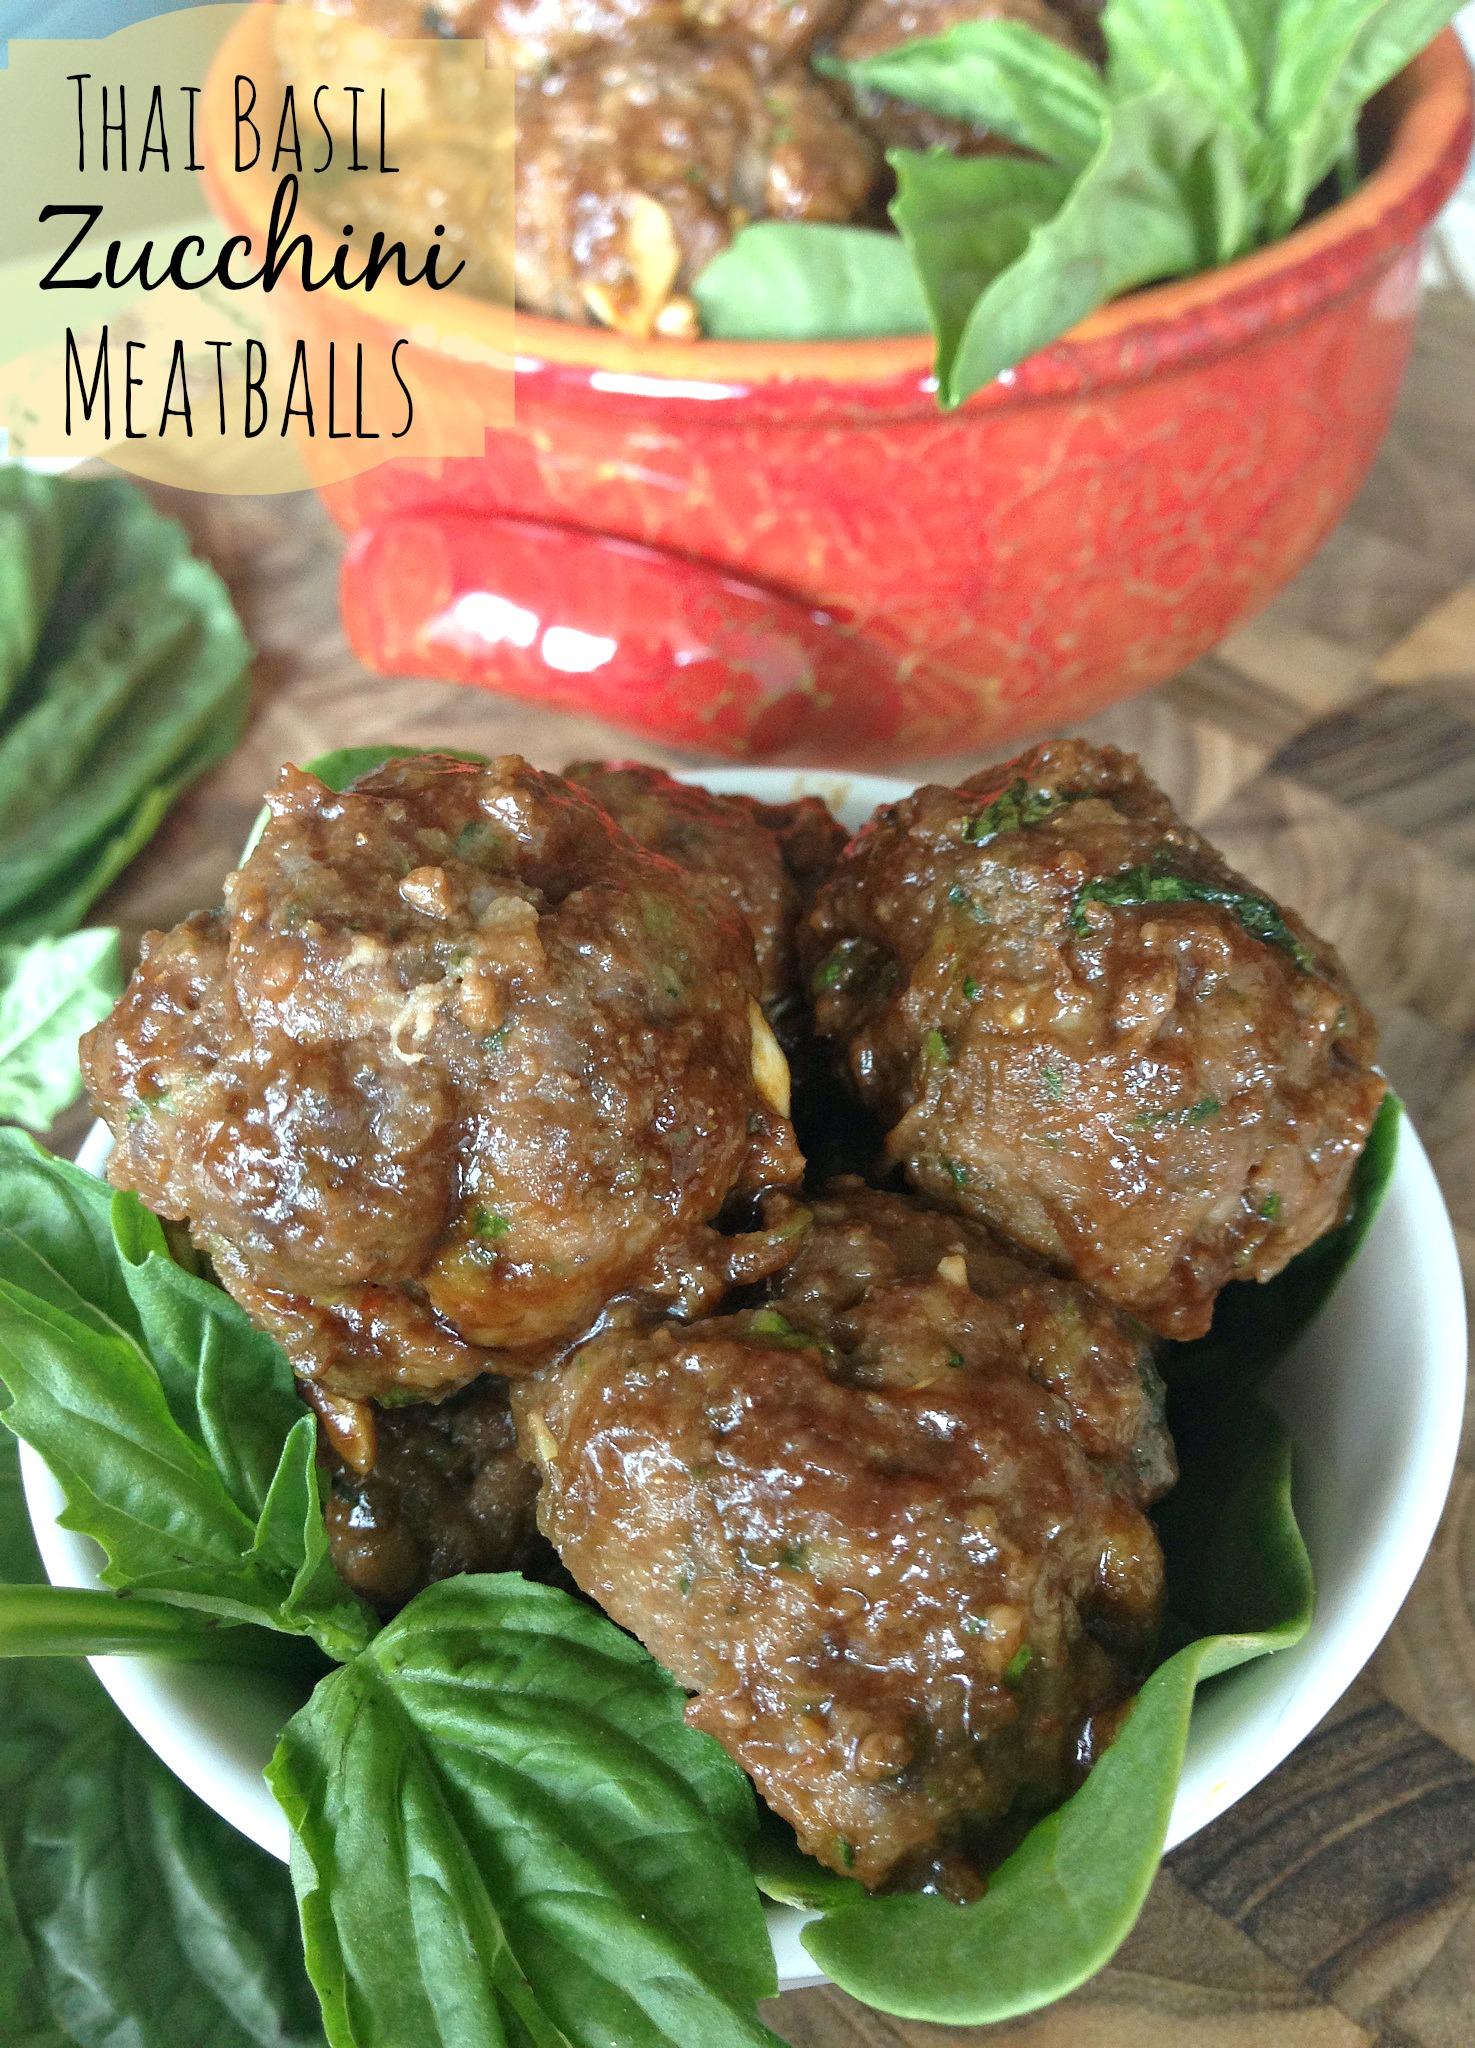 Thai Basil Zucchini Meatballs